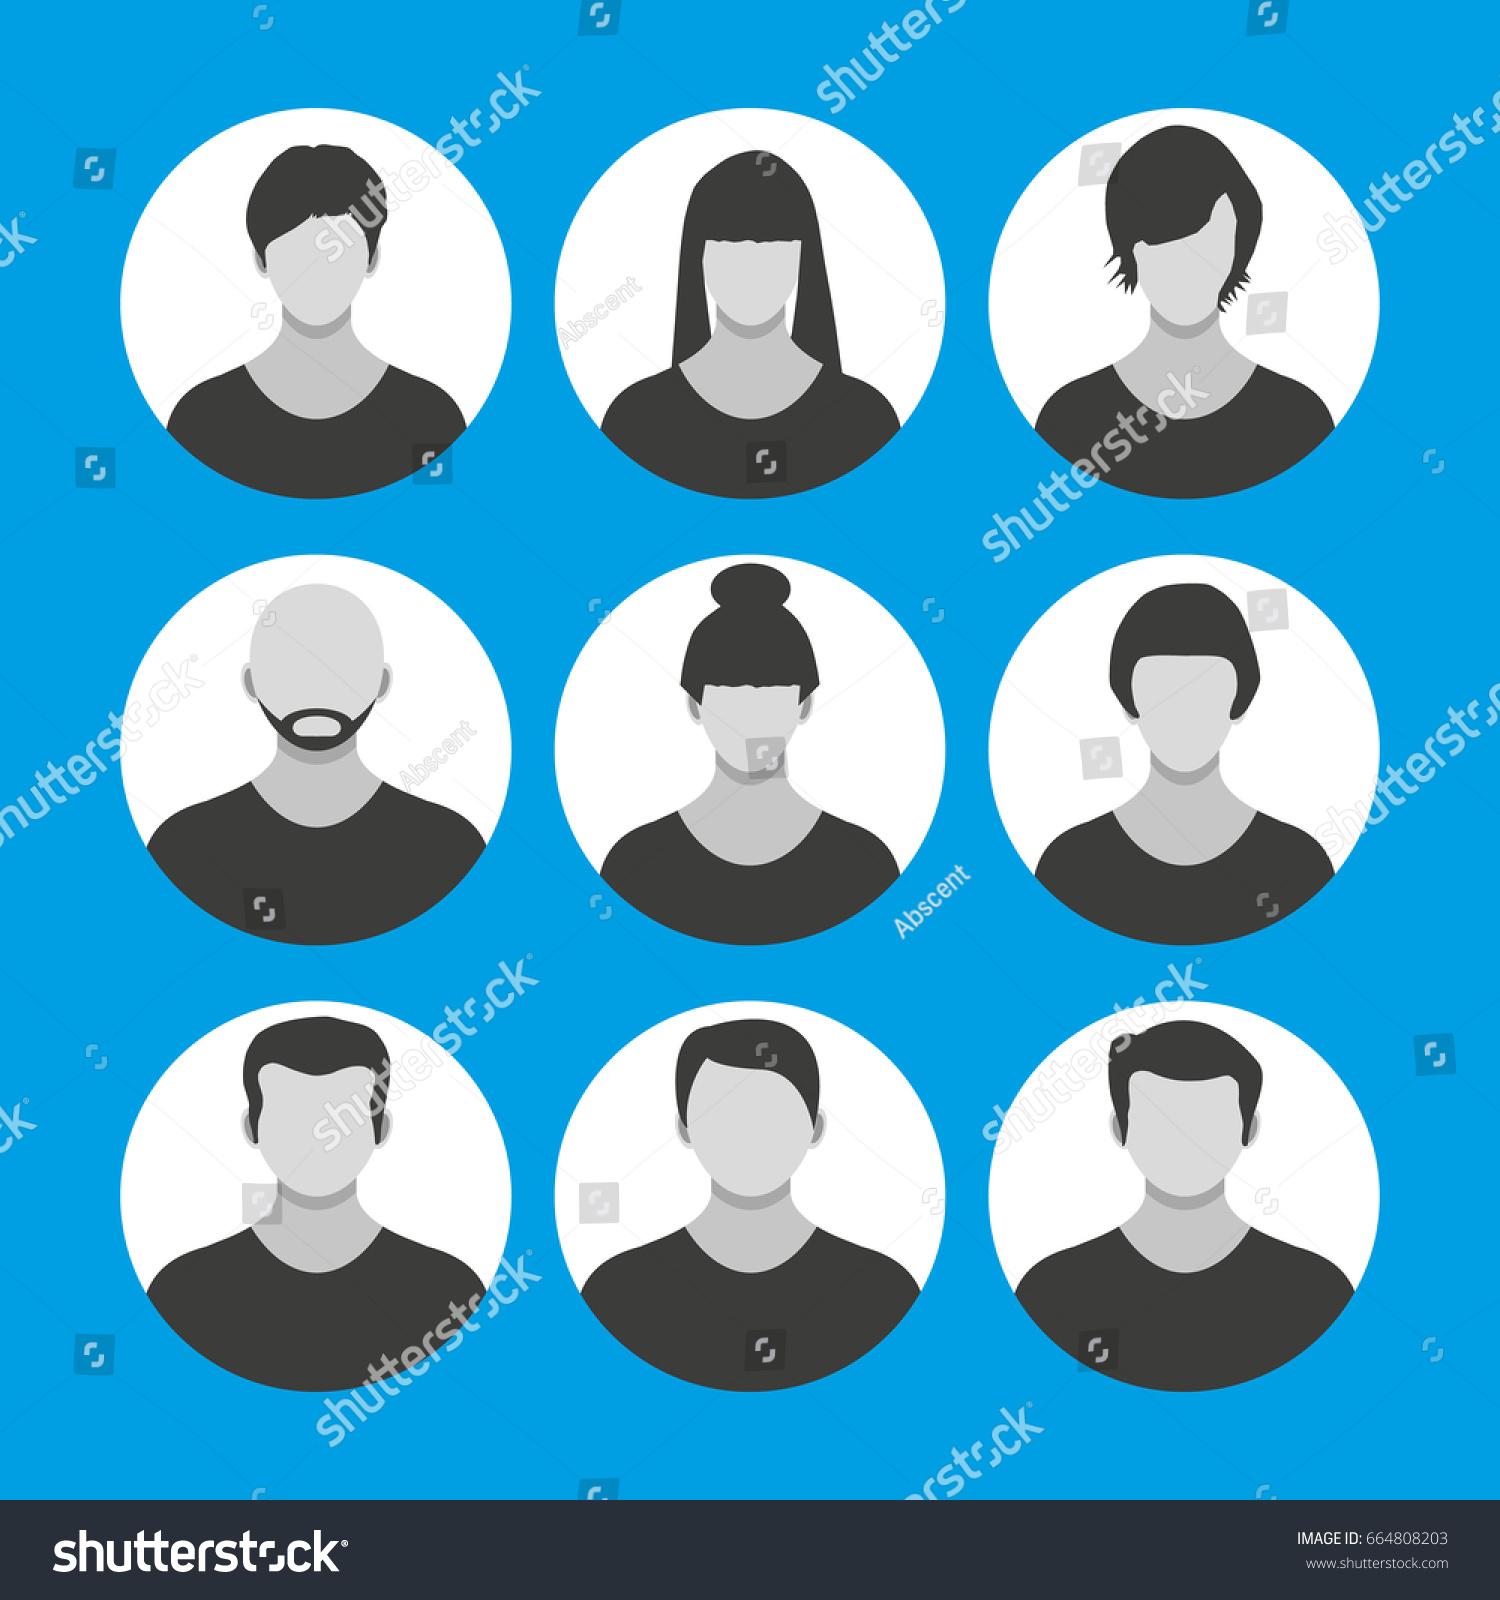 people face avatar icon cartoon character stock vector 664808203